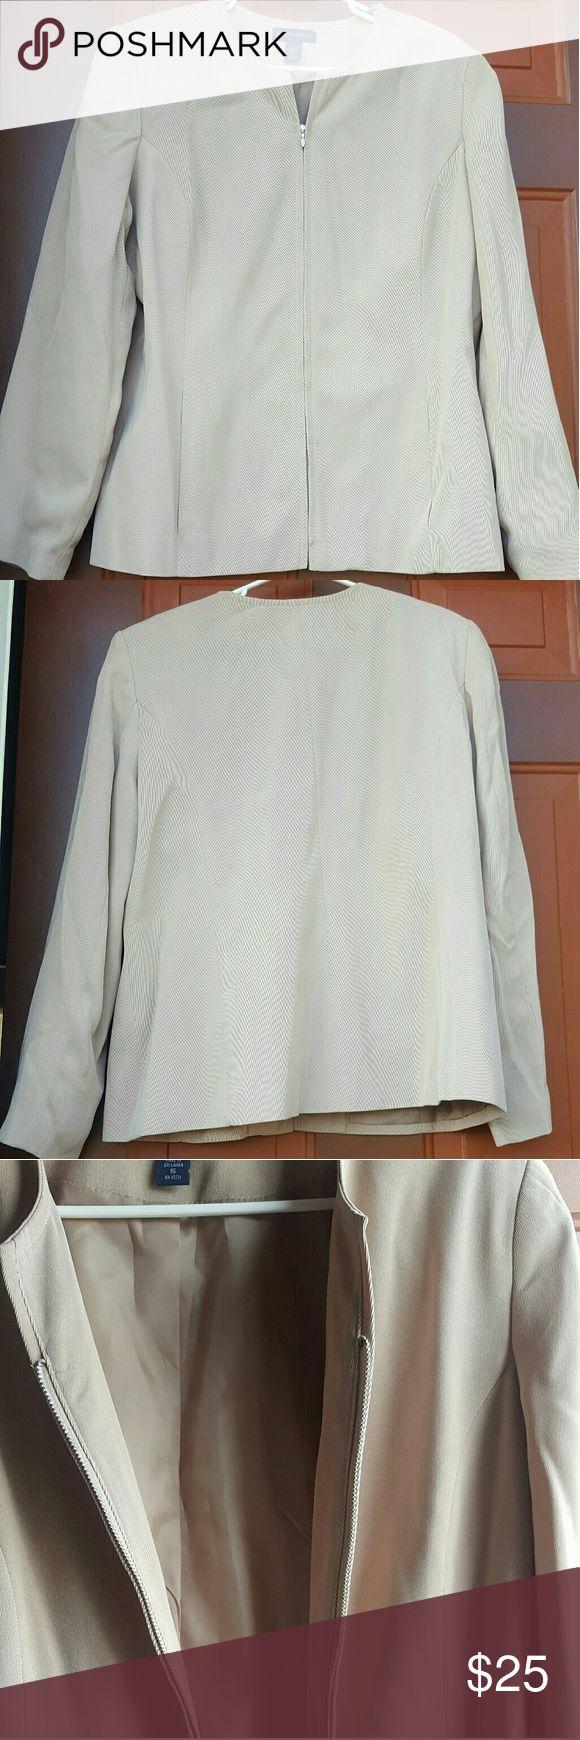 Collarless blazer with zipper Its a blazer/jacket with no collar with a zipper down the middle Karen Scott Jackets & Coats Blazers